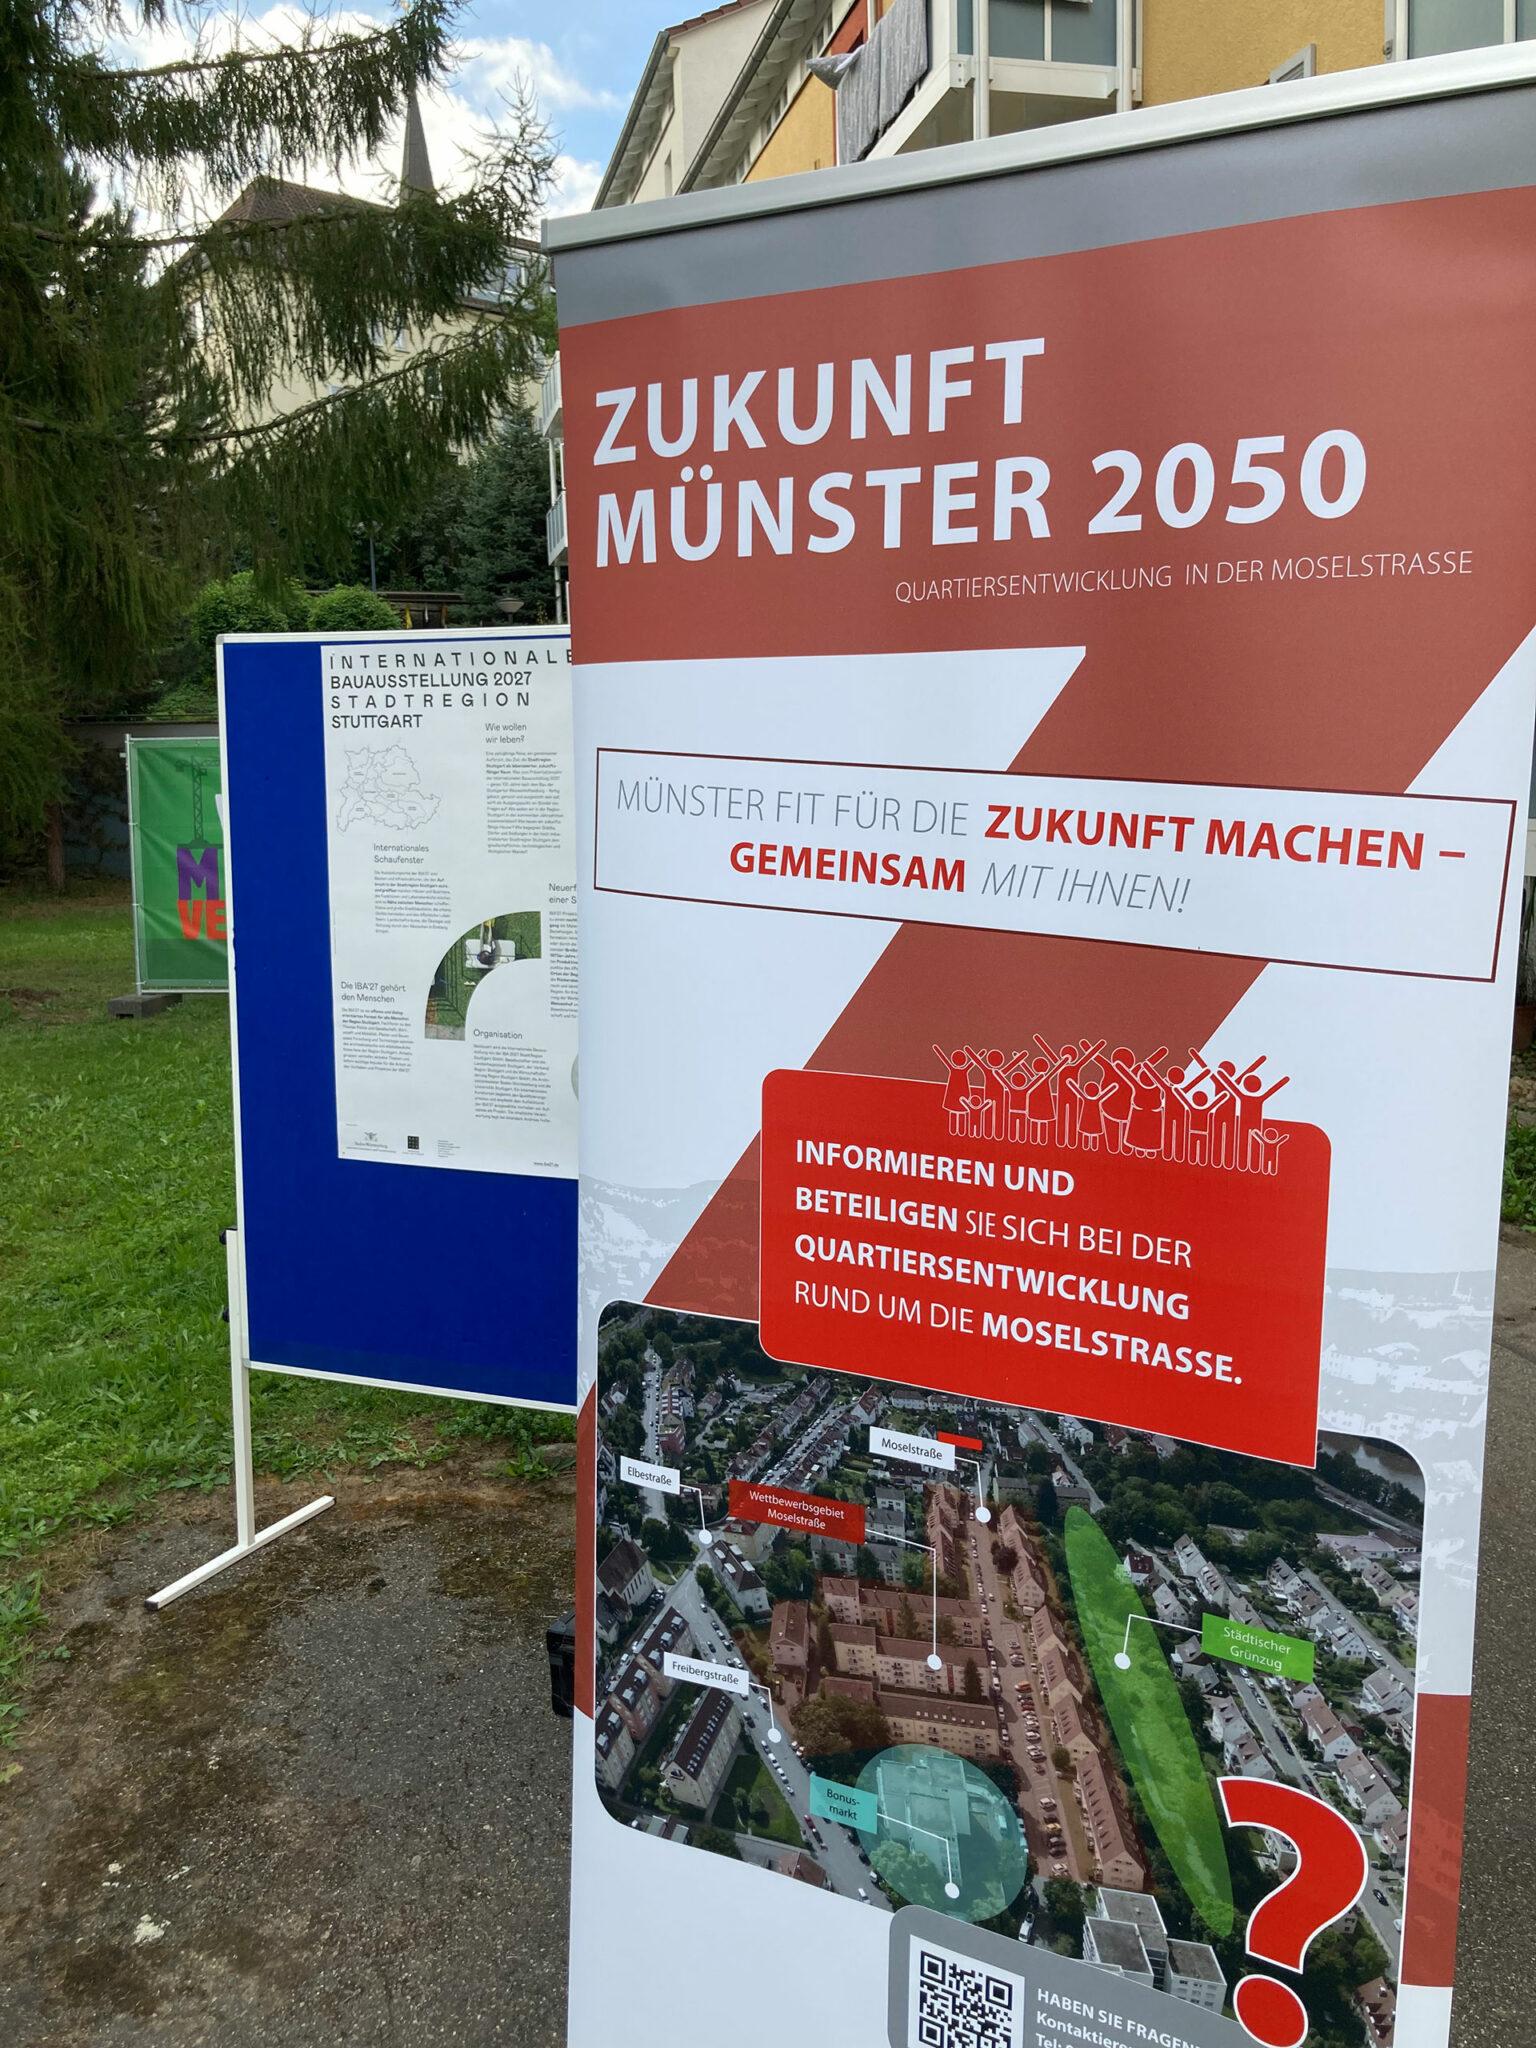 Zukunft Münster 2050 (Bild: BGM / Stadtberatung Dr. Sven Fries)